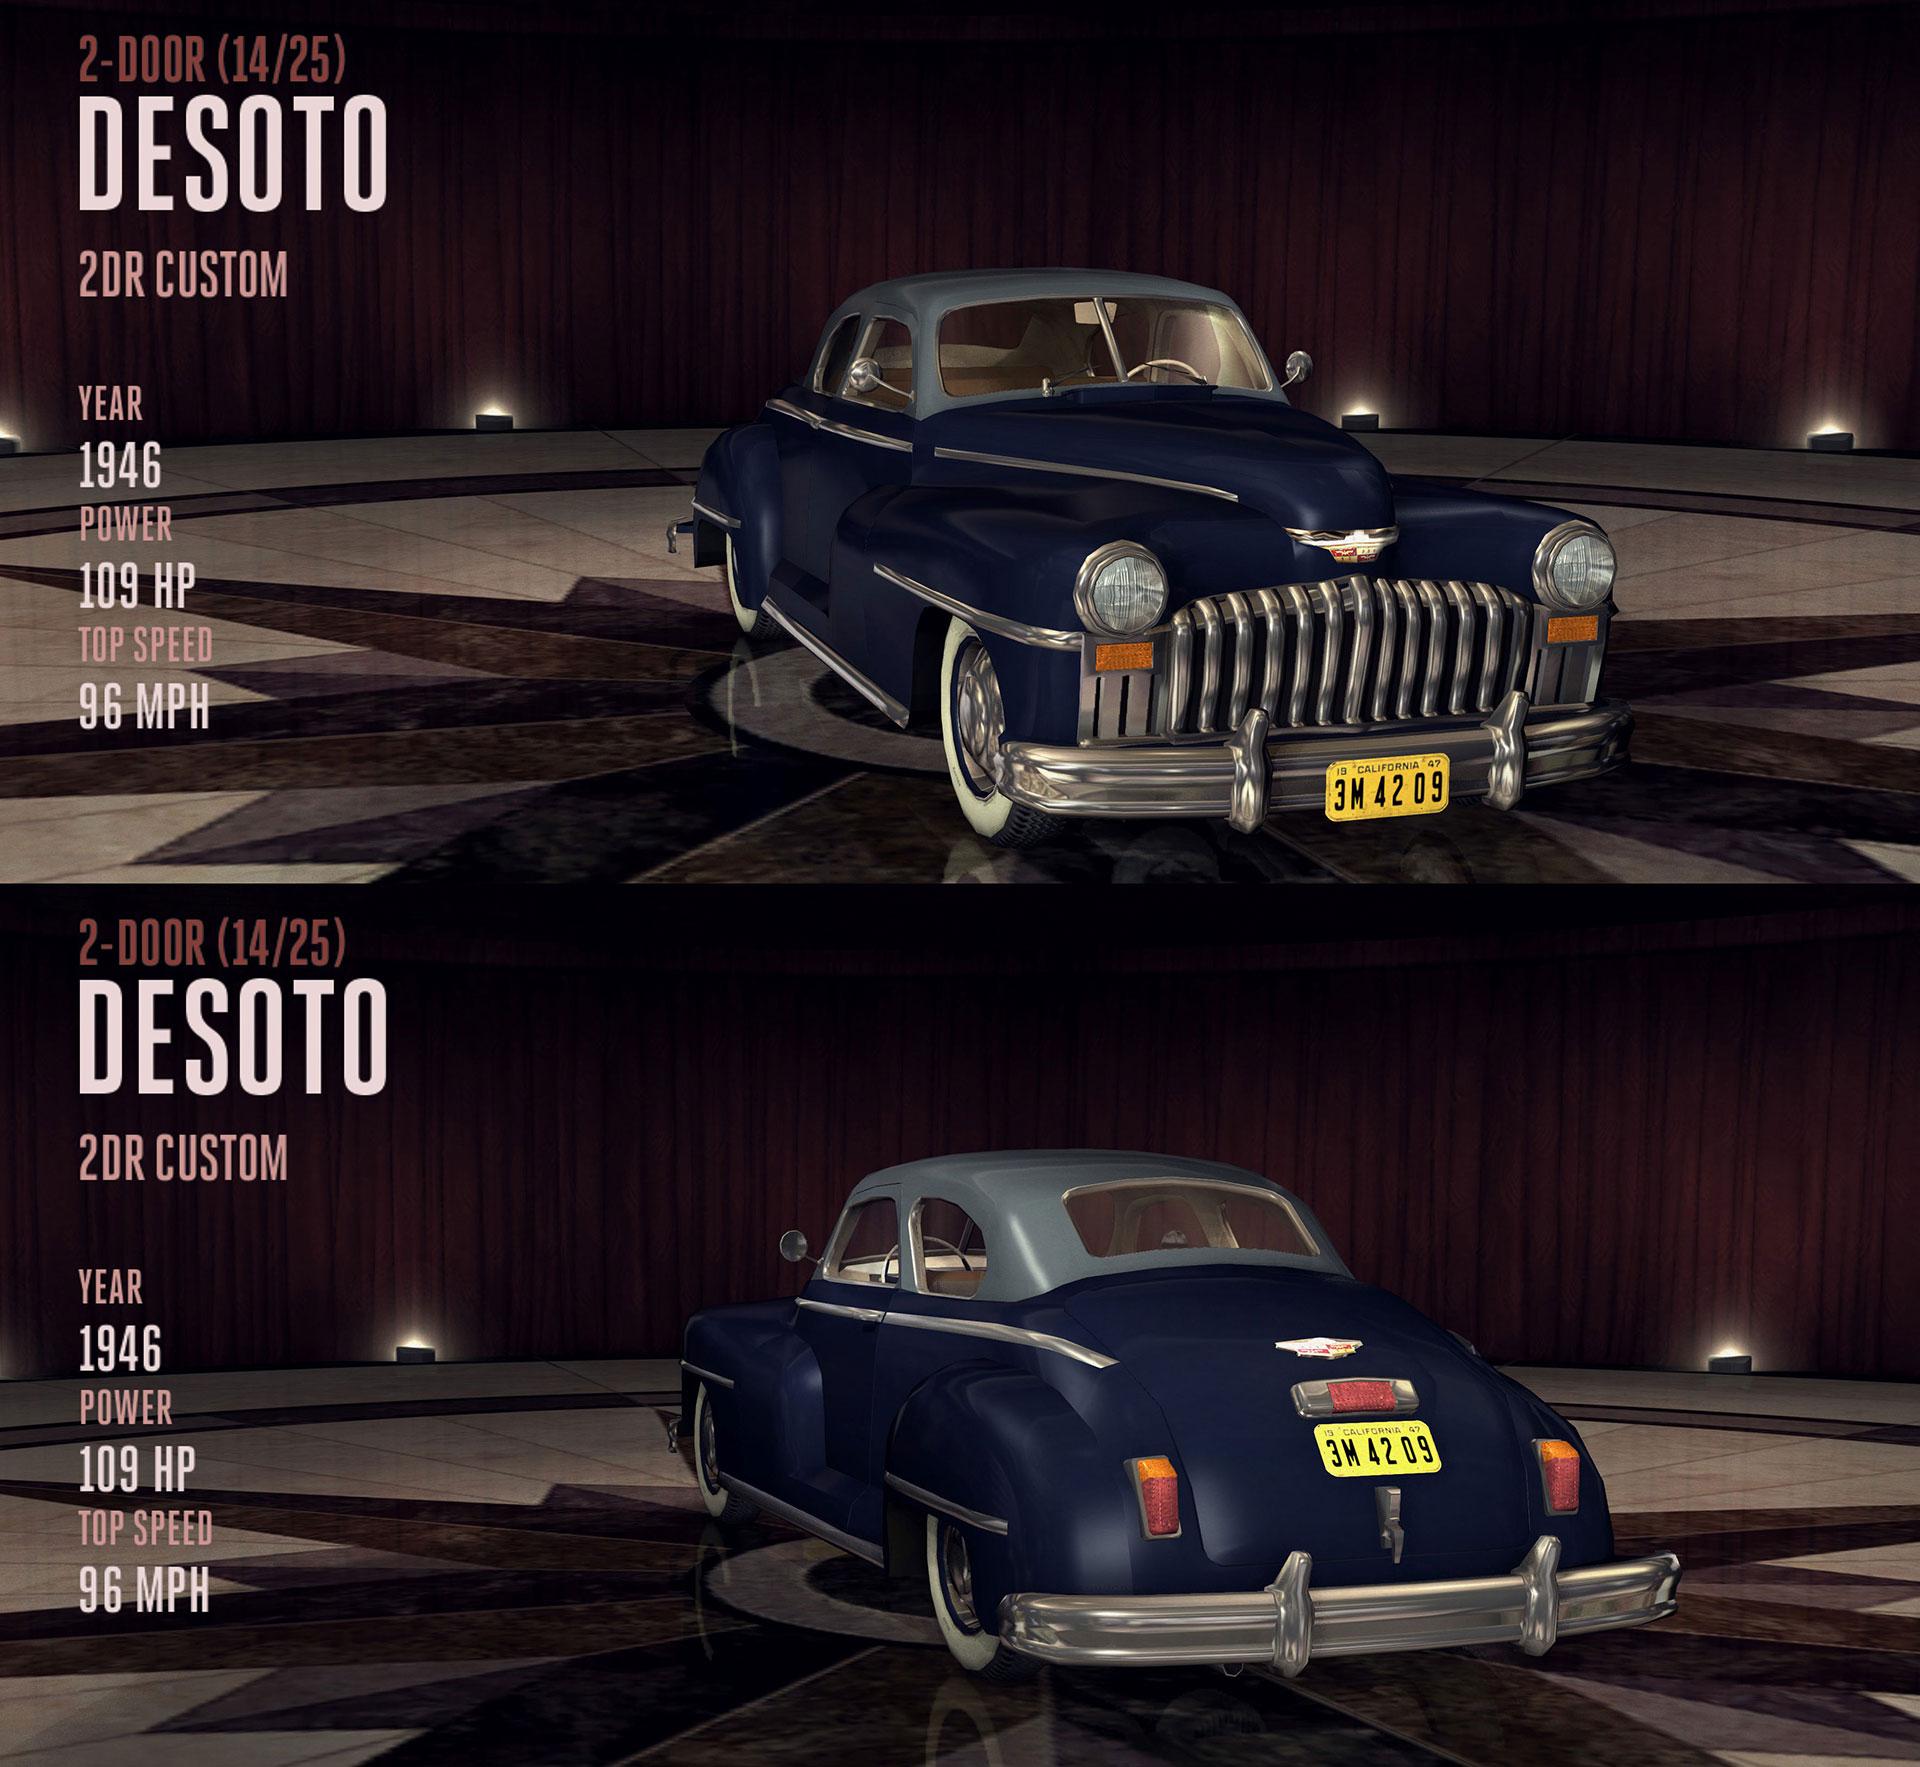 File:1946-desoto-2dr-custom.jpg